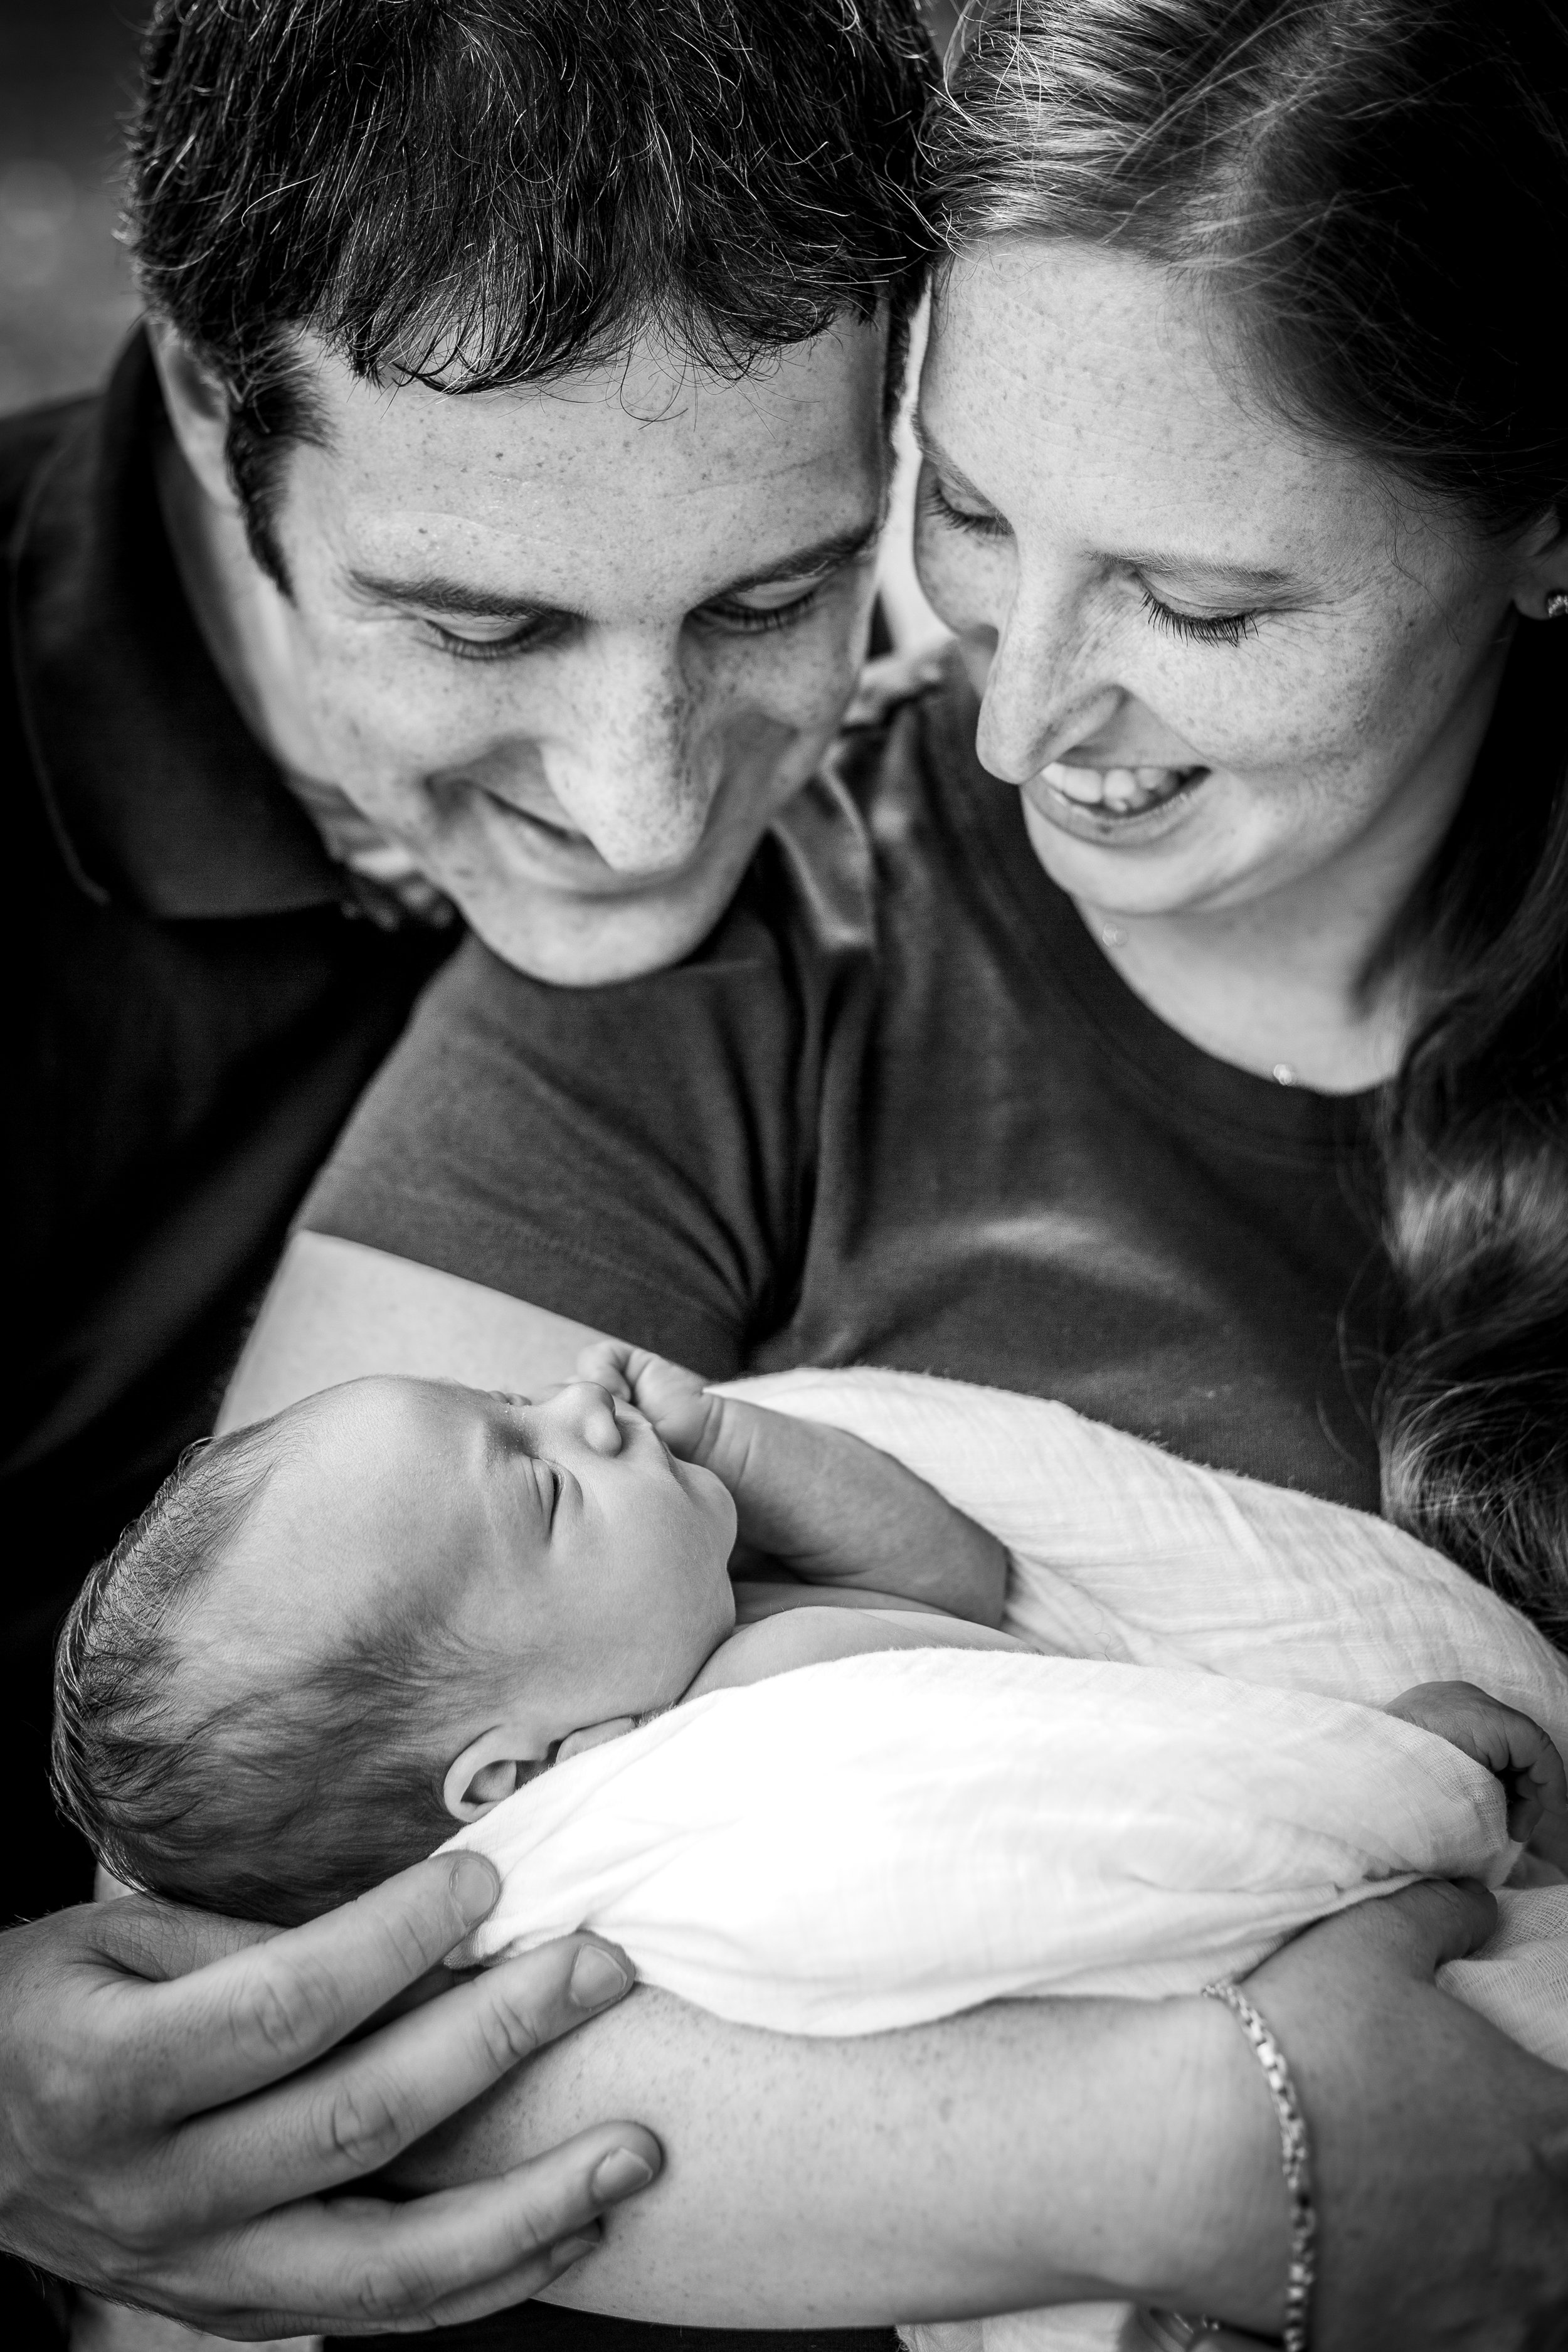 newborn_stuytown-4.jpg